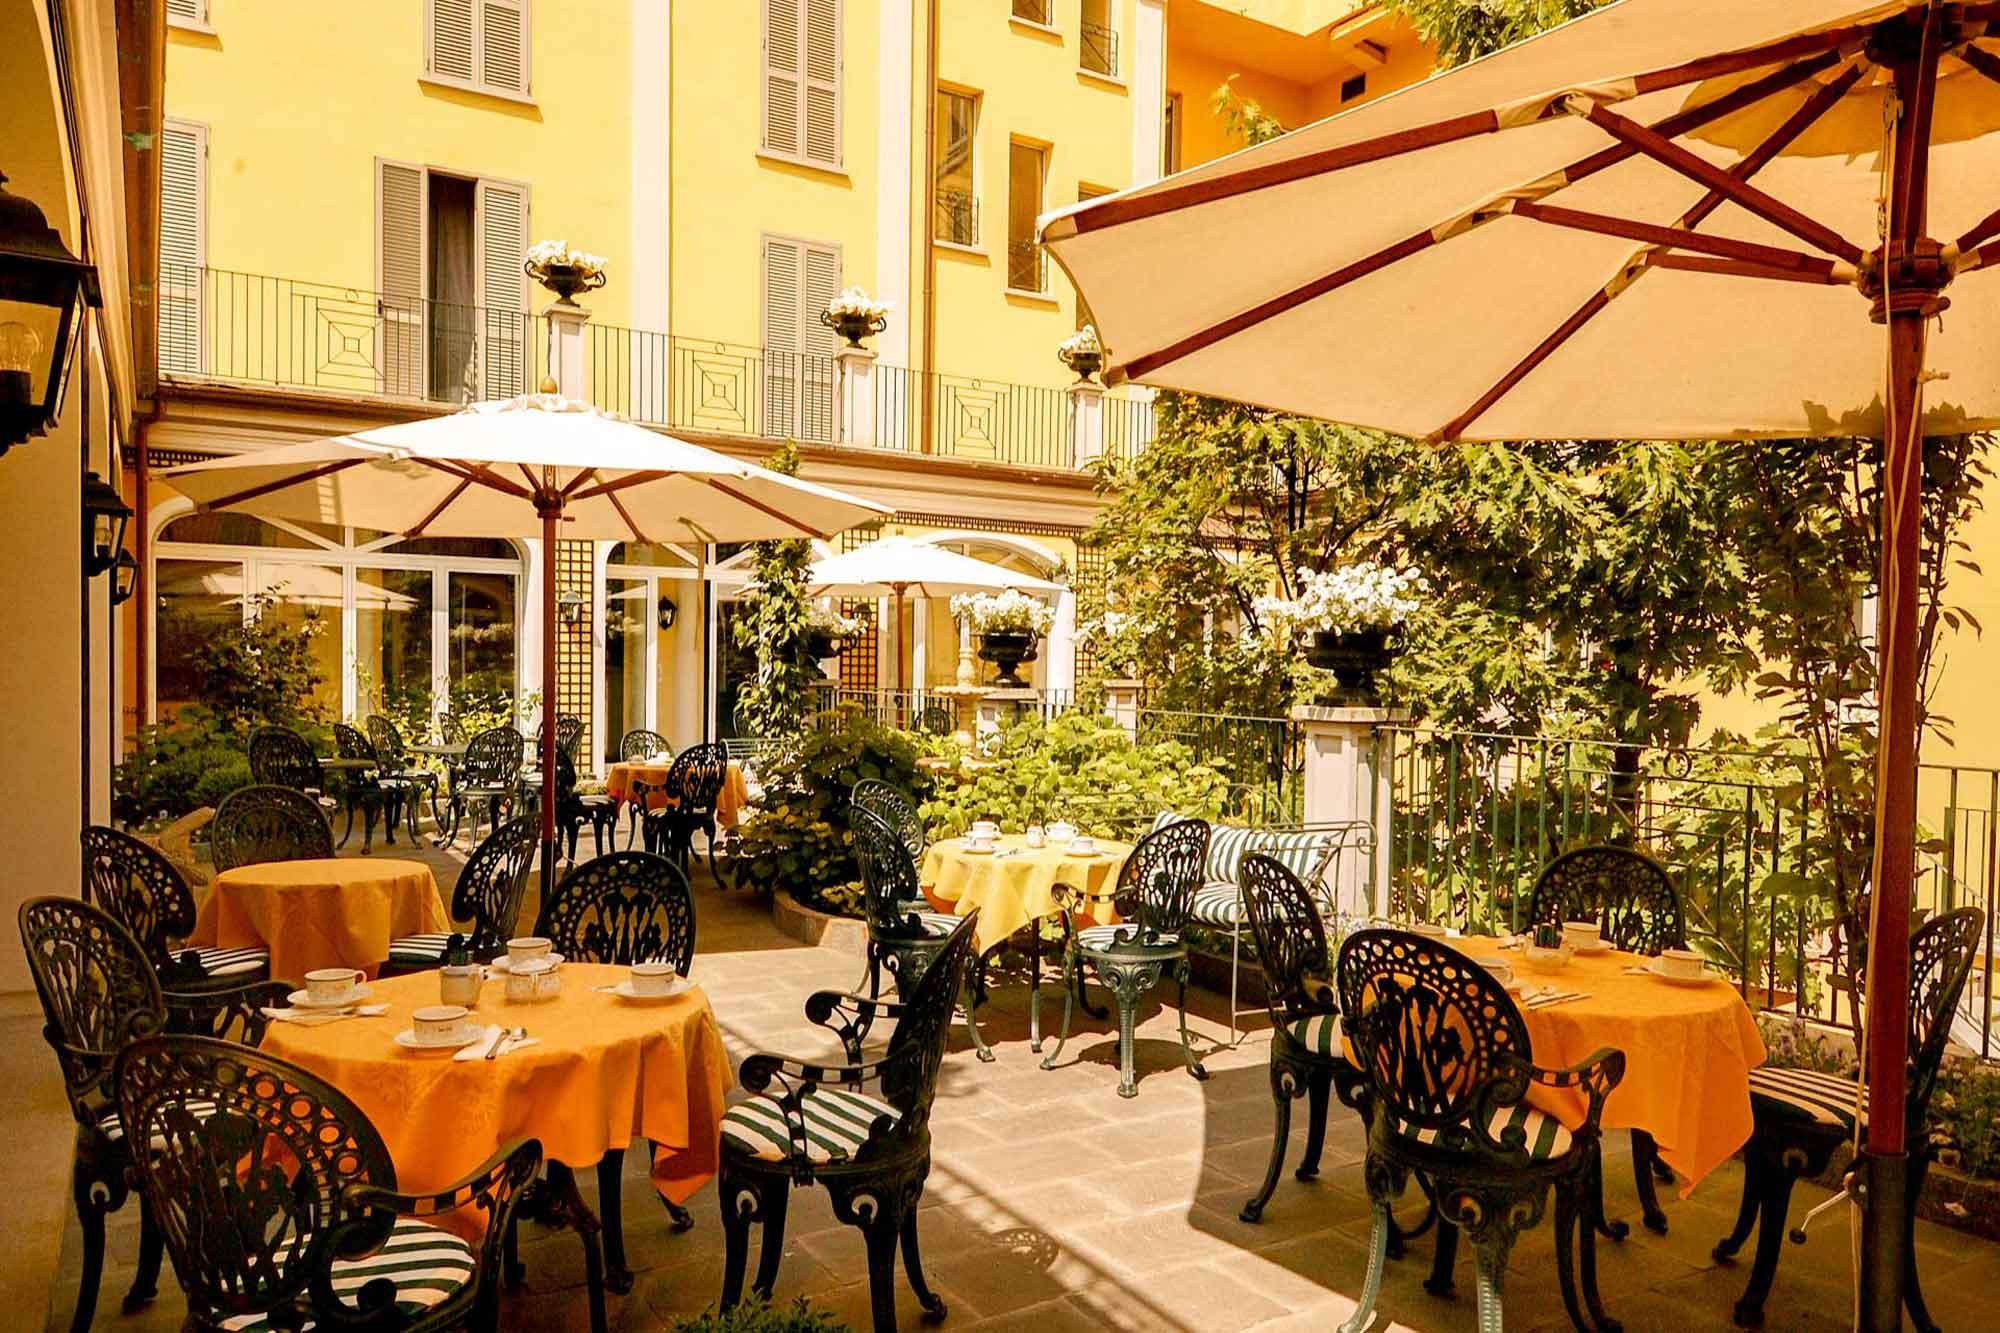 Hotel Victoria Turin centre ville, hotel 4 étoiles avec SPA et jardin